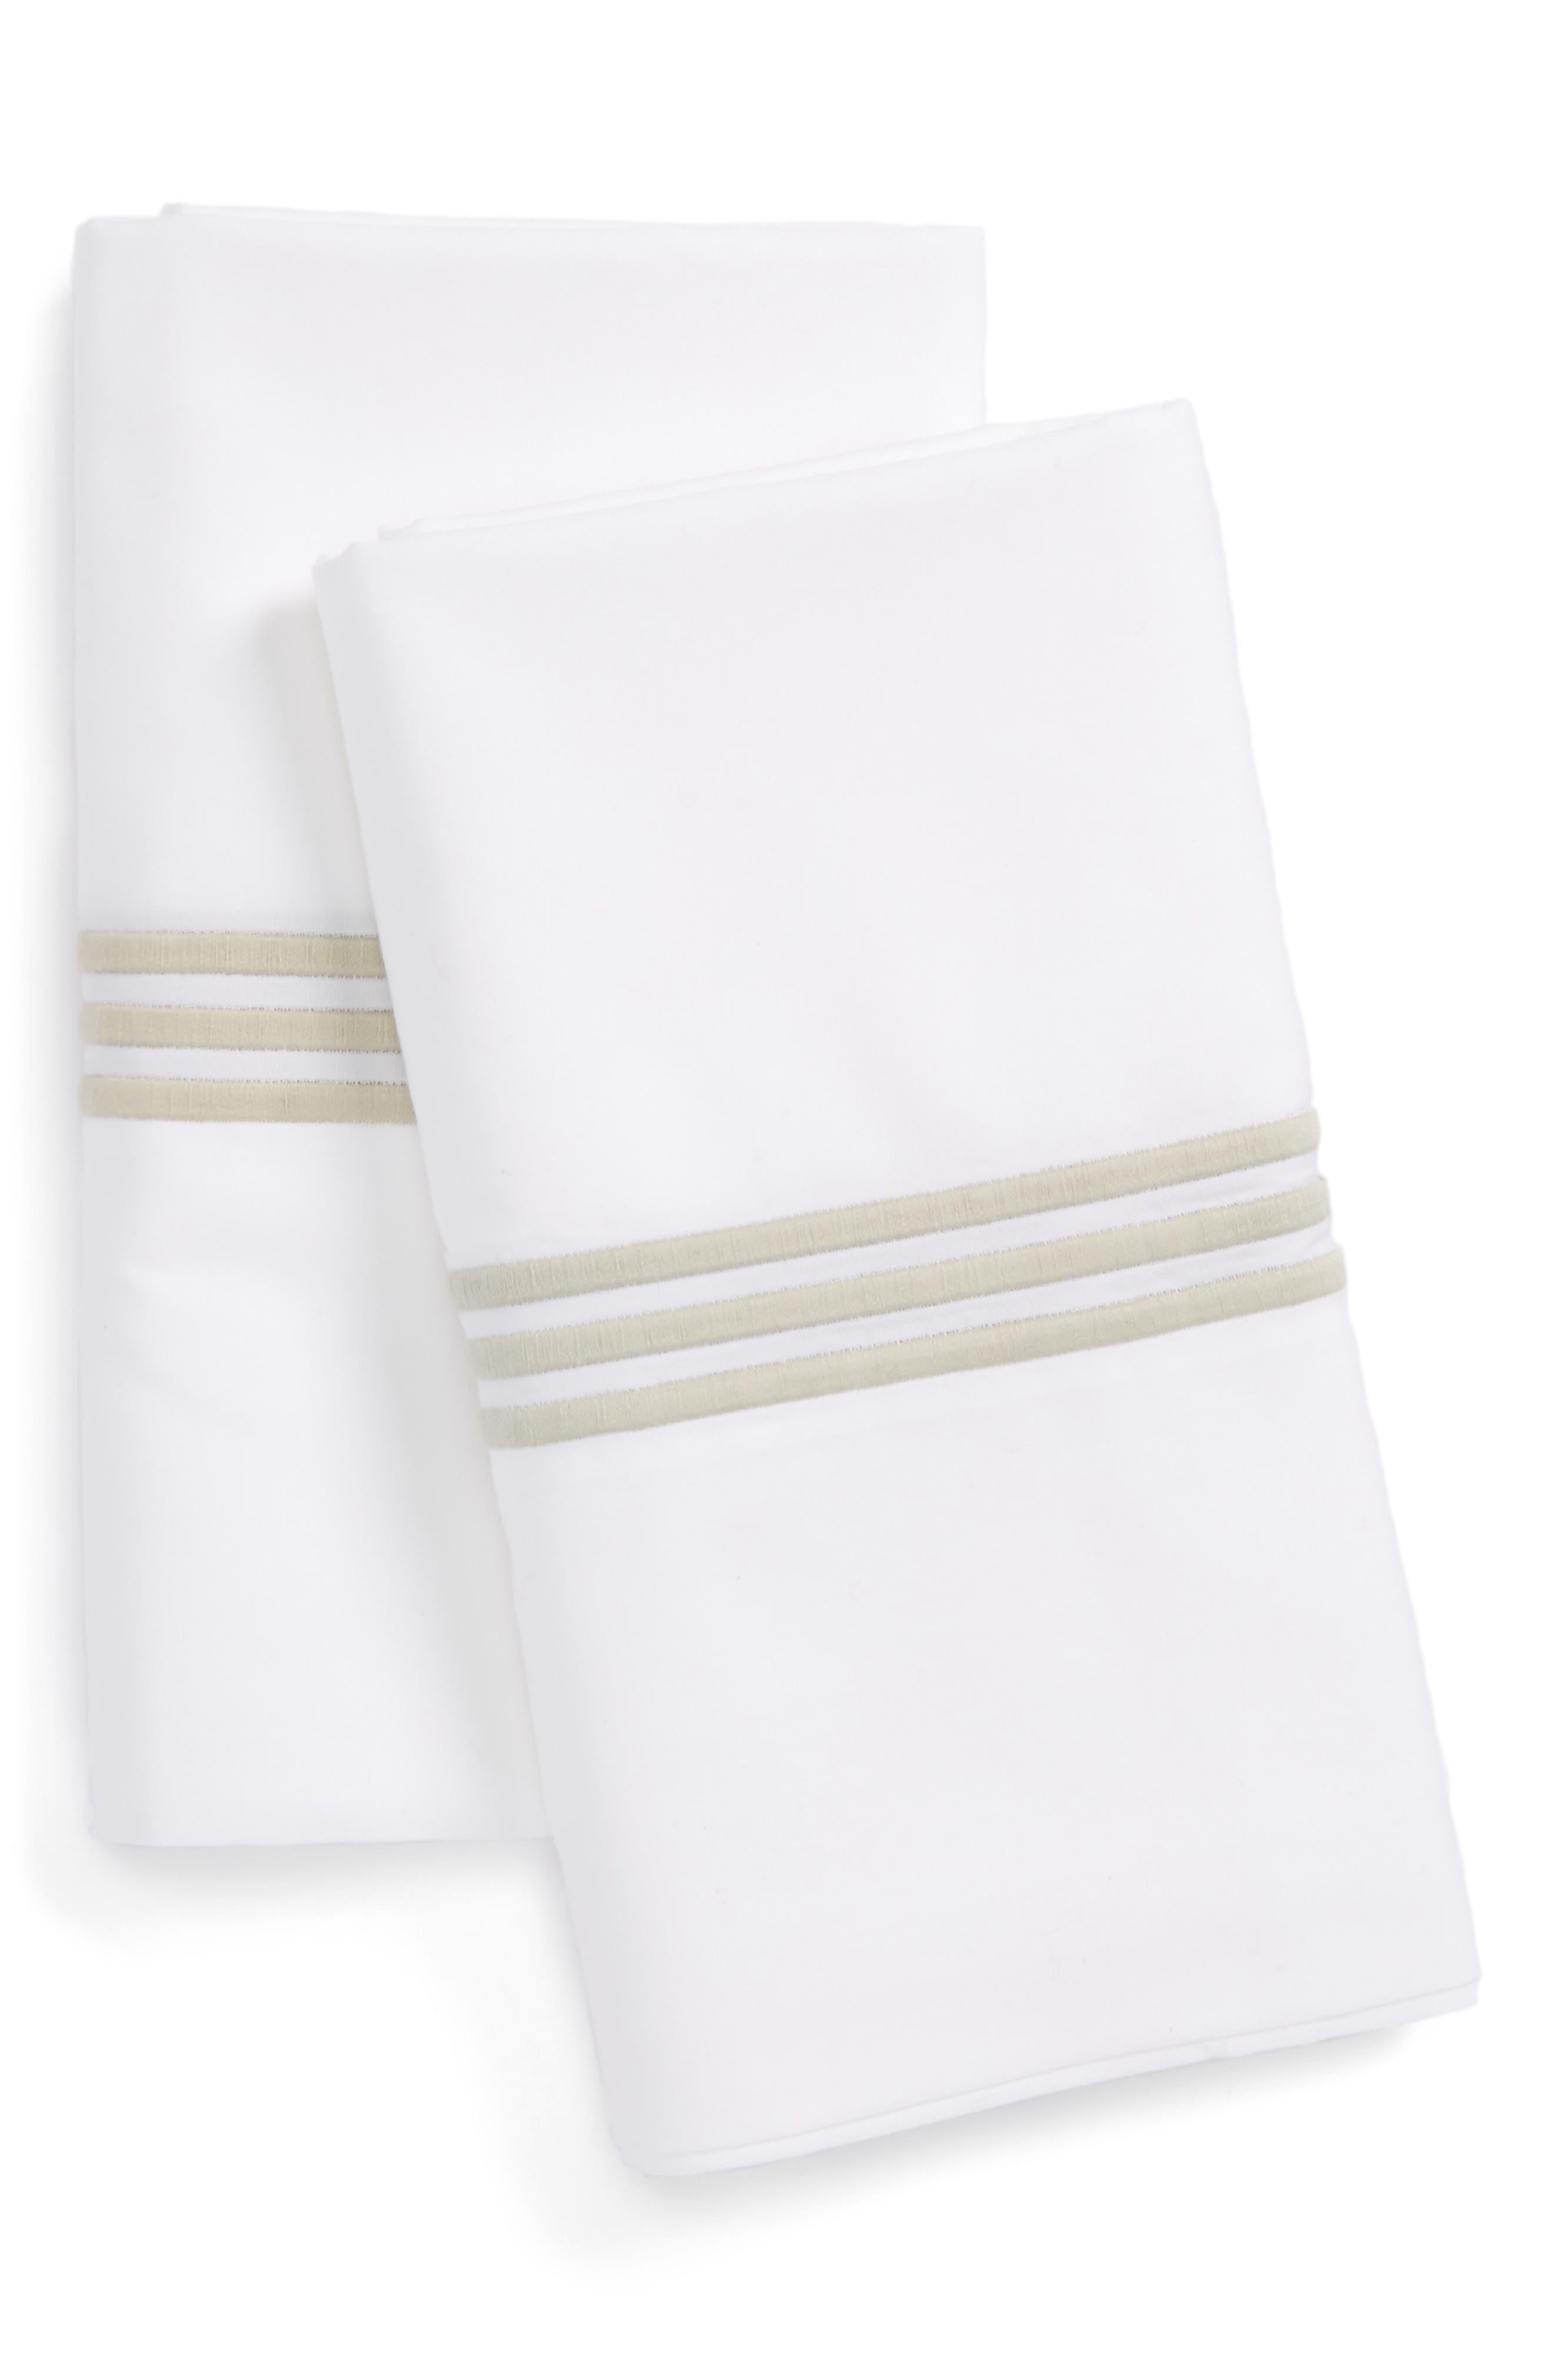 Bel Tempo Pillowcases,                         Main,                         color, Almond